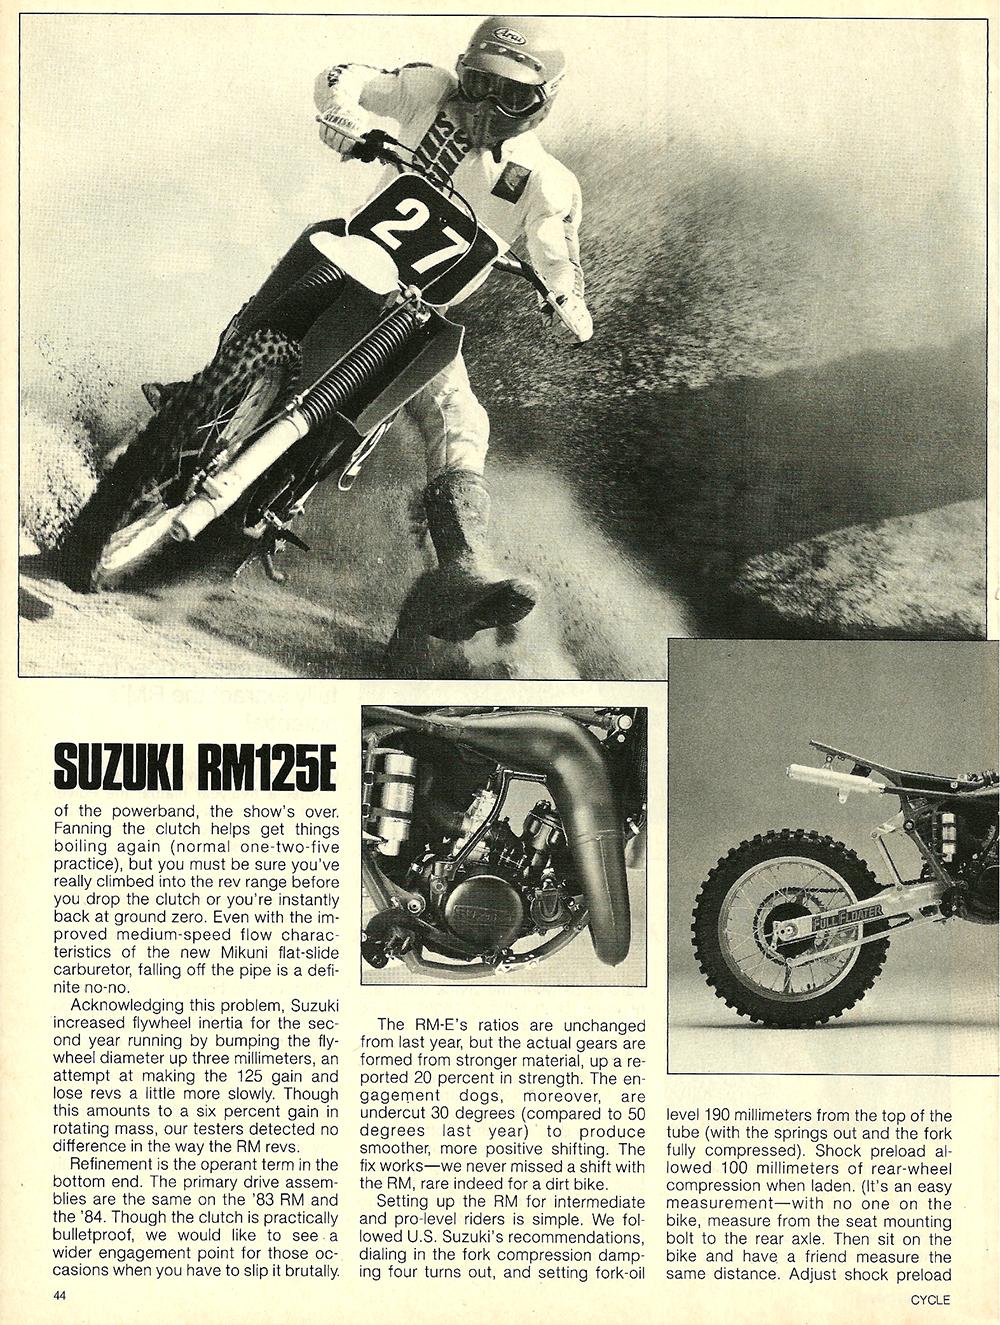 1984 Suzuki RM125E road test 5.jpg